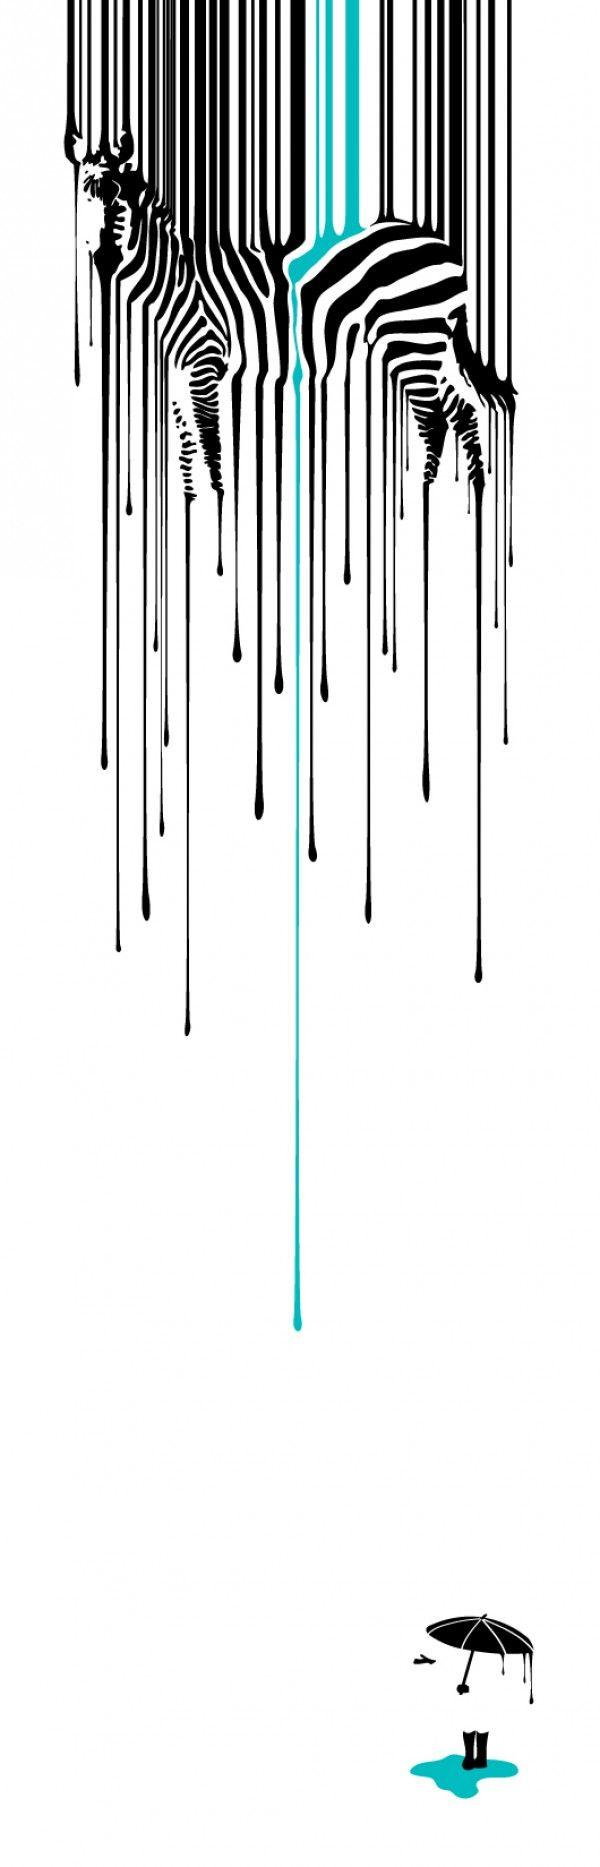 "Image Spark - Image tagged ""line"", ""graphic"", ""zebra"" - megpluth"